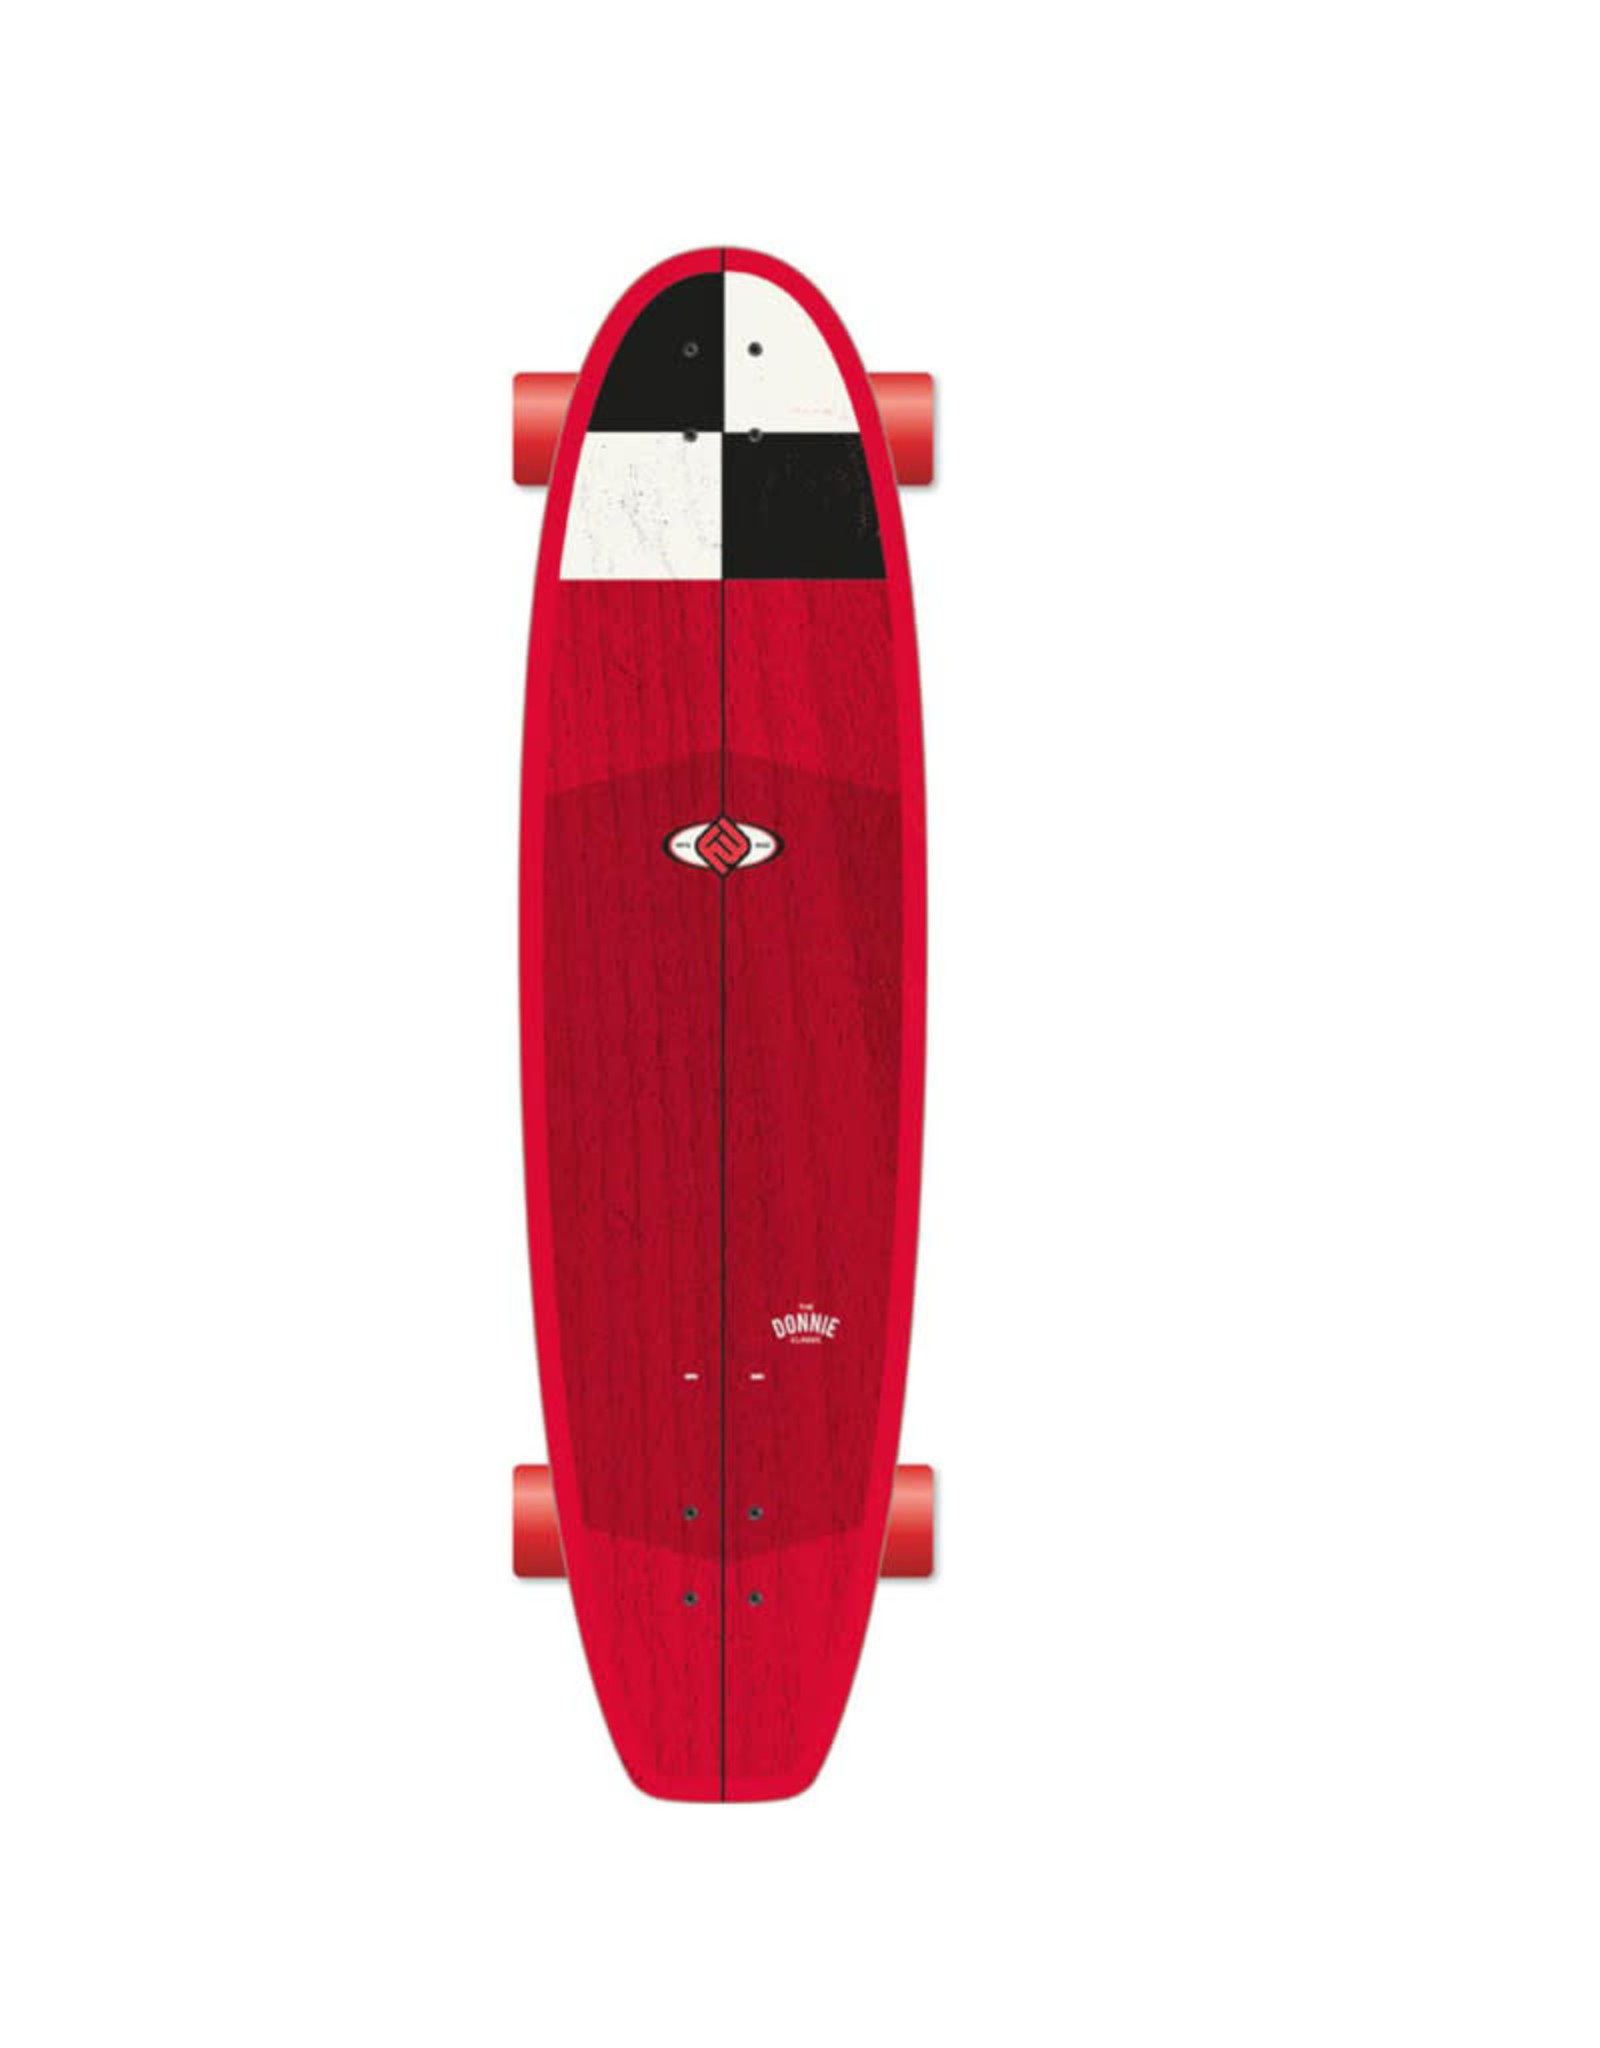 Flying Wheels Flying Wheels Surf Skateboard 38 Donnie Capitol Surf Truck